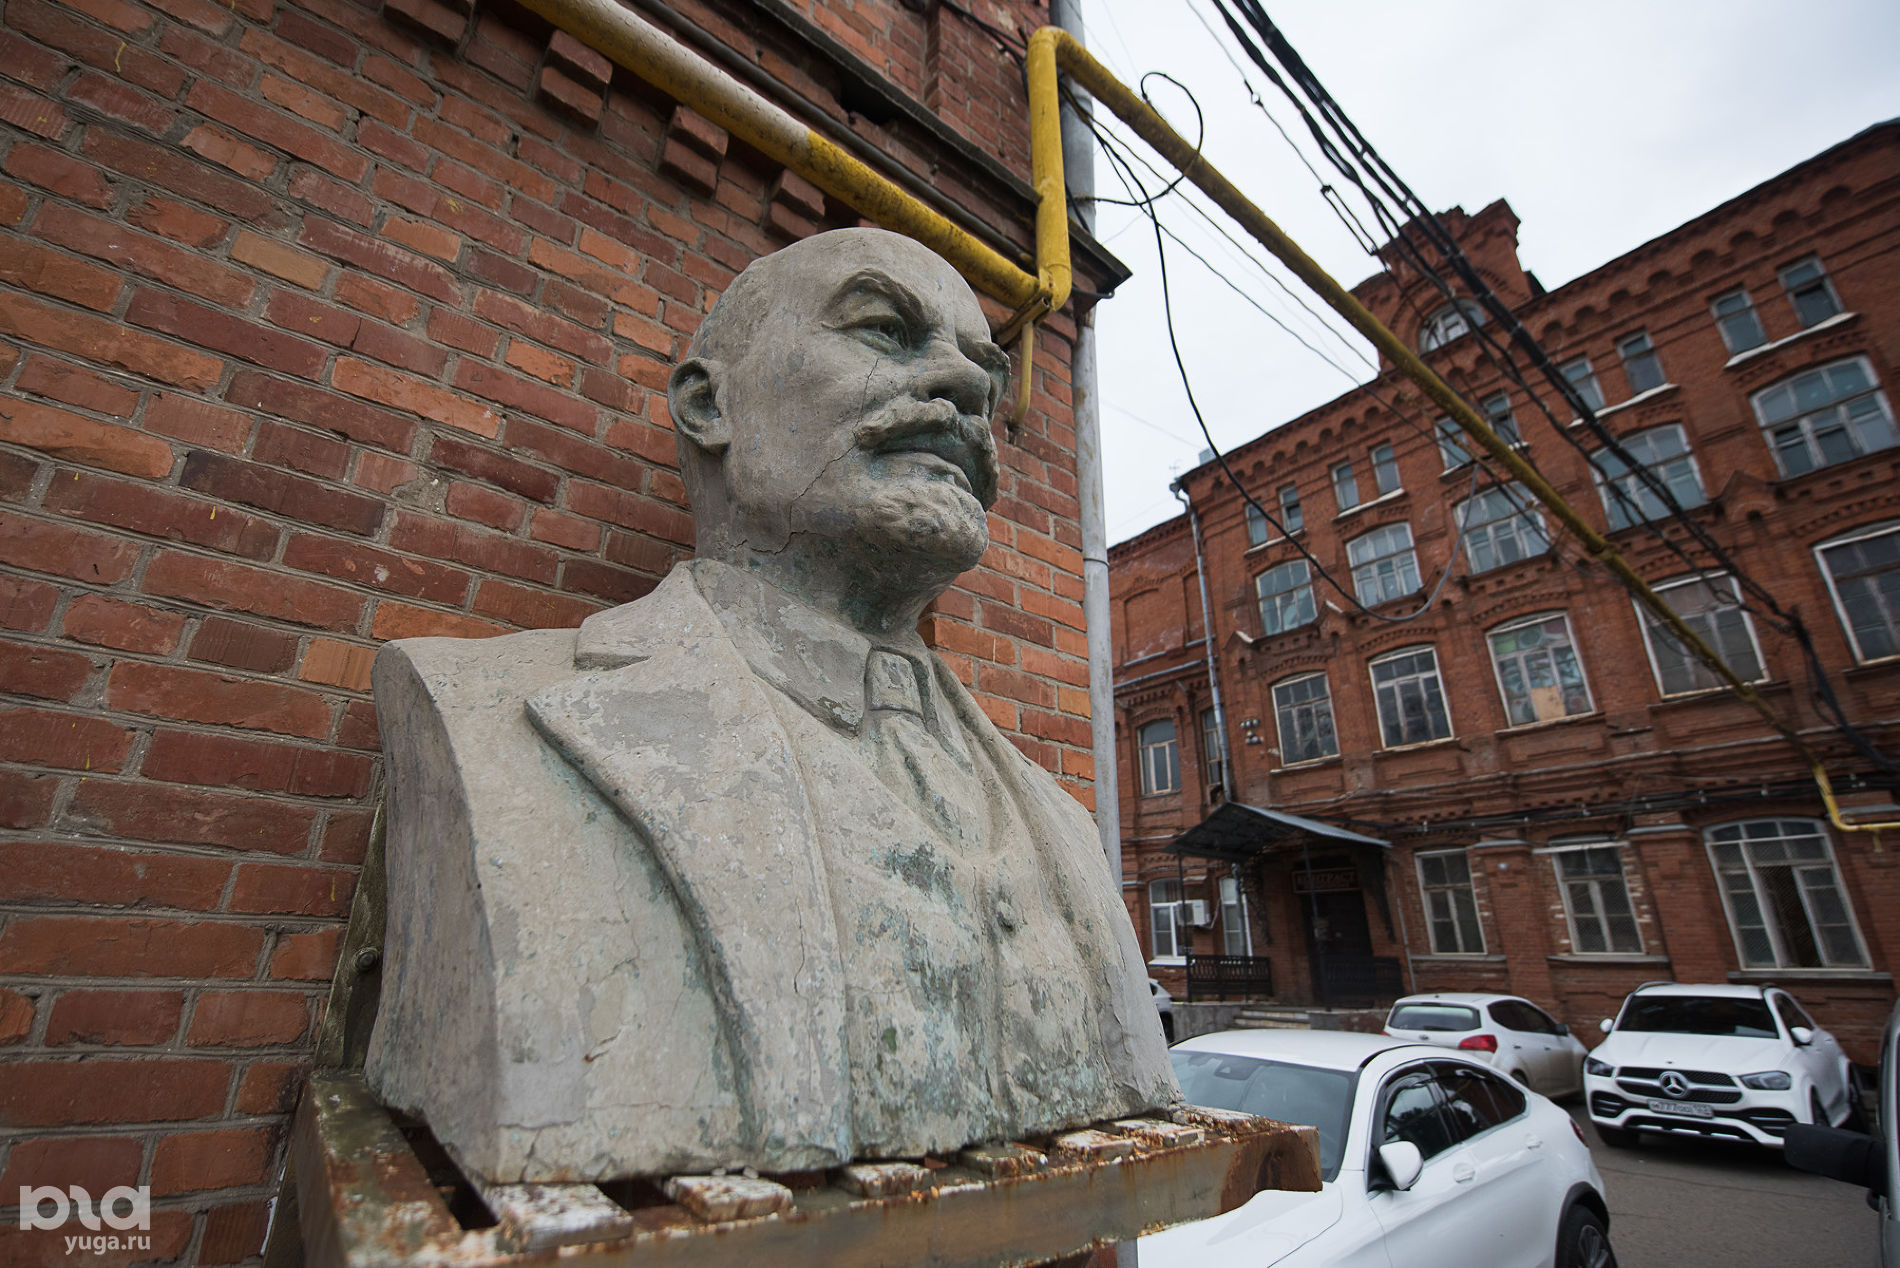 Бюст Ленина на улице Седина ©Фото Елены Синеок, Юга.ру